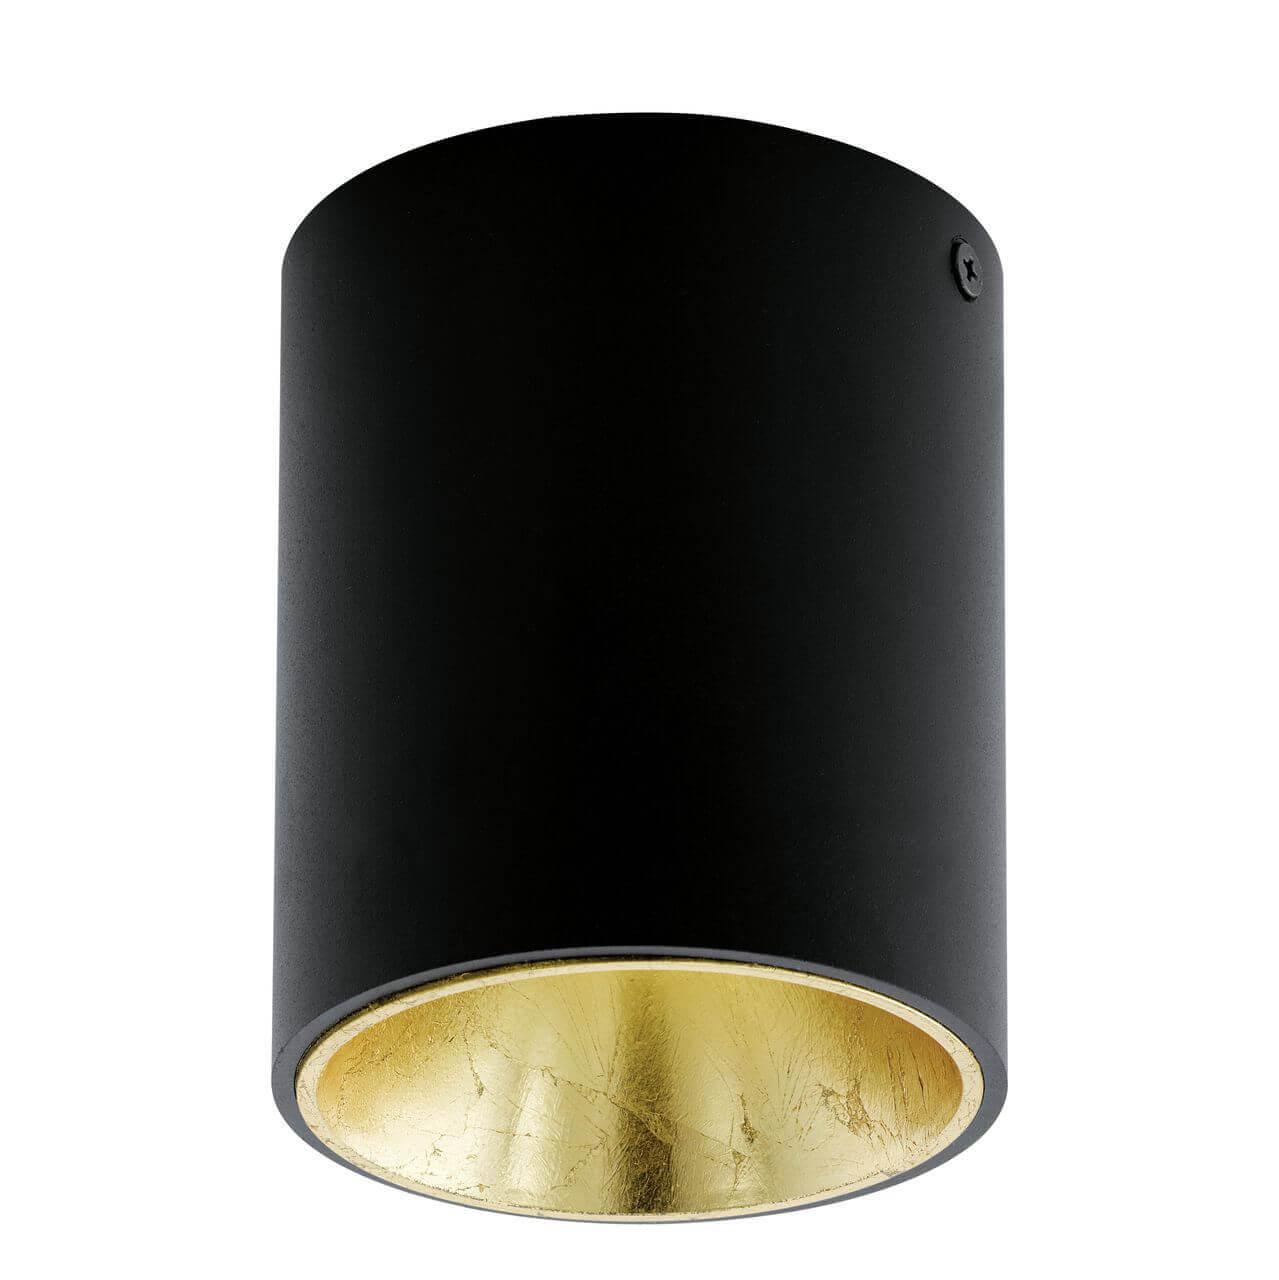 Светильник Eglo 94502 Polasso